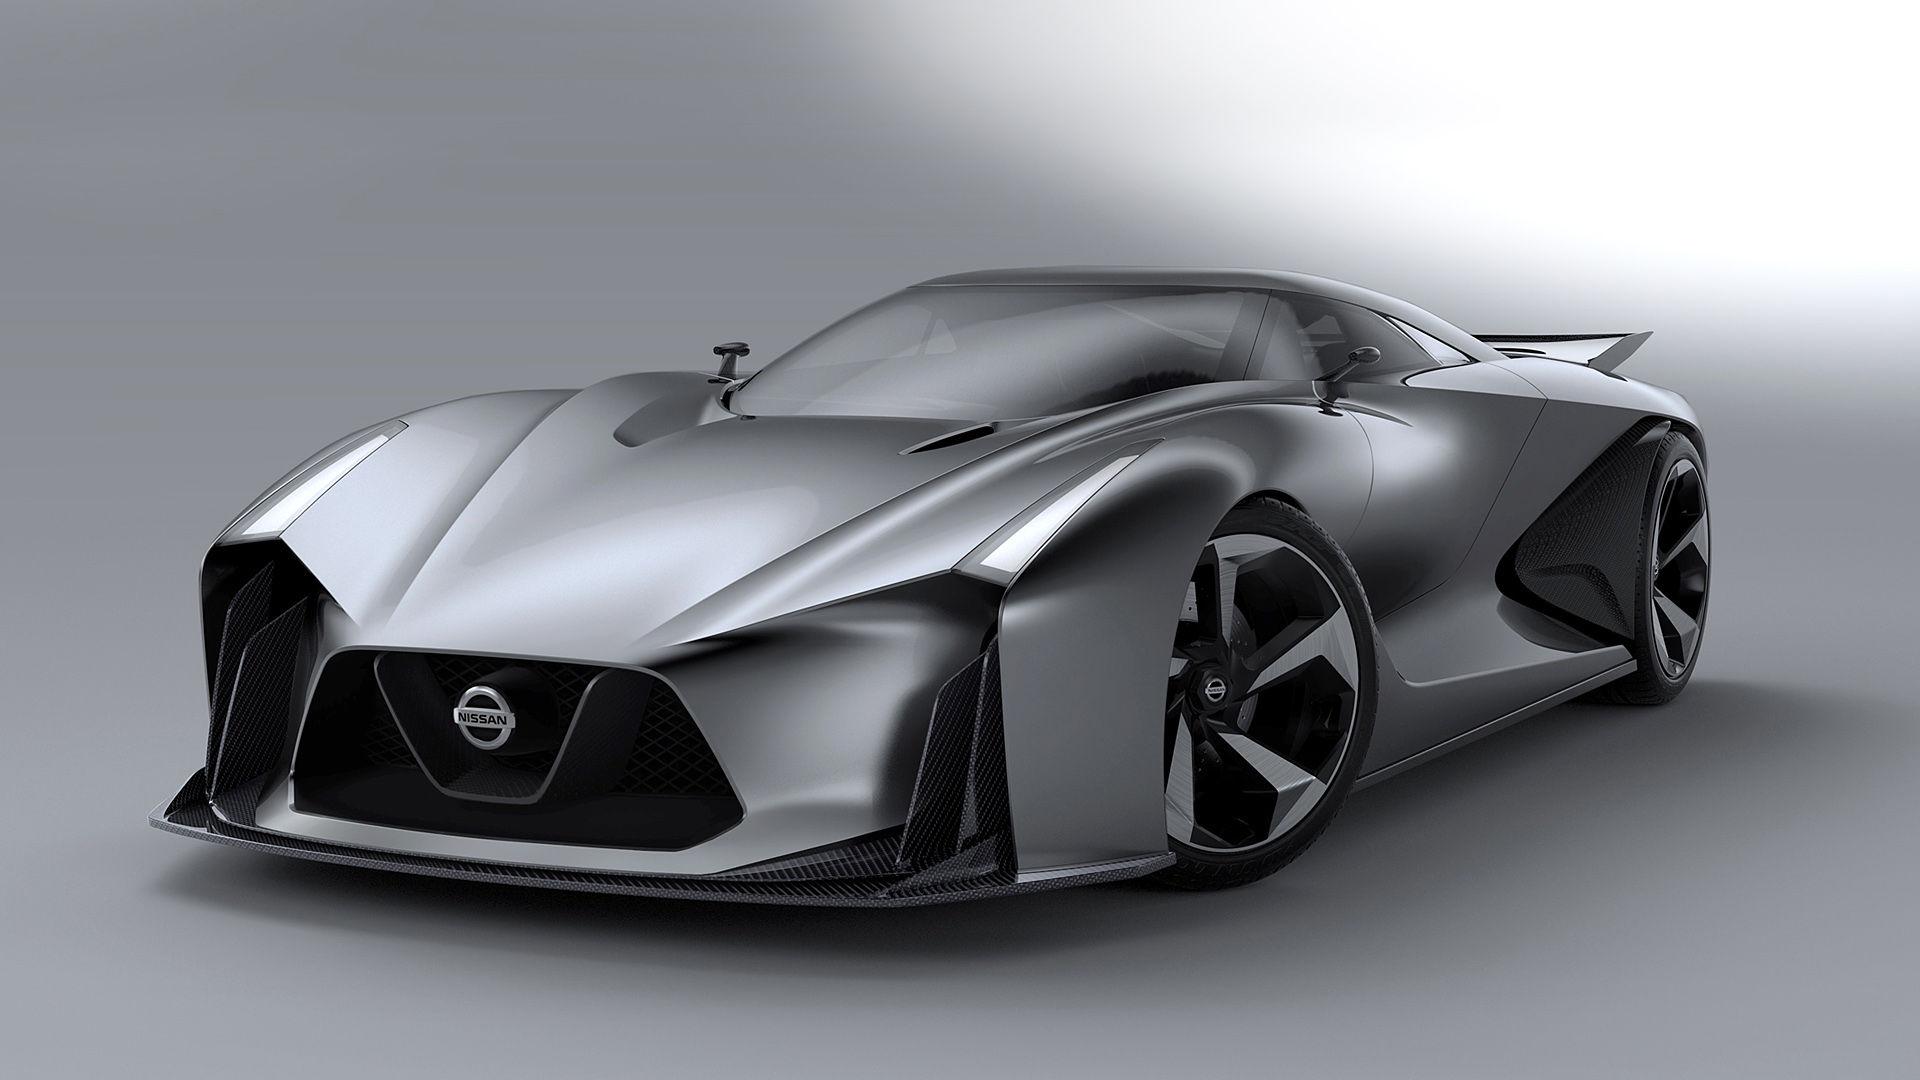 2014 Nissan 2020 Vision Gran Turismo Concept